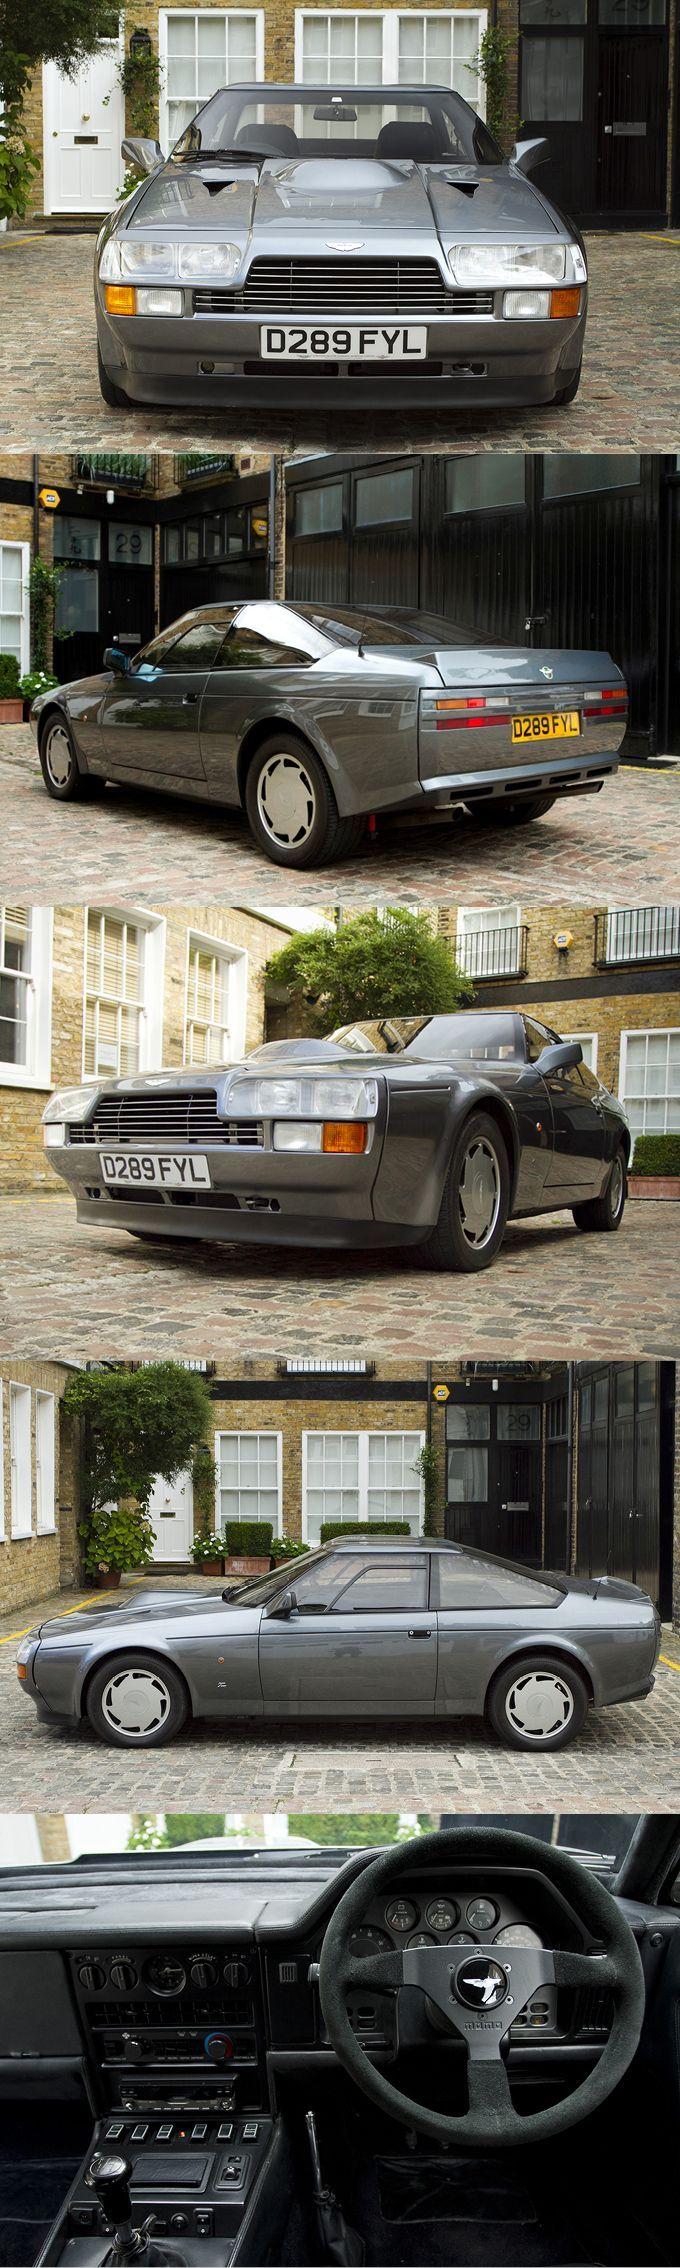 1986 Aston Martin V8 Vantage Zagato / 430hp 5.3l V8 / Hexagoncalssics / 89 produced / grey / UK / 17-359 #astonmartinvintagecars